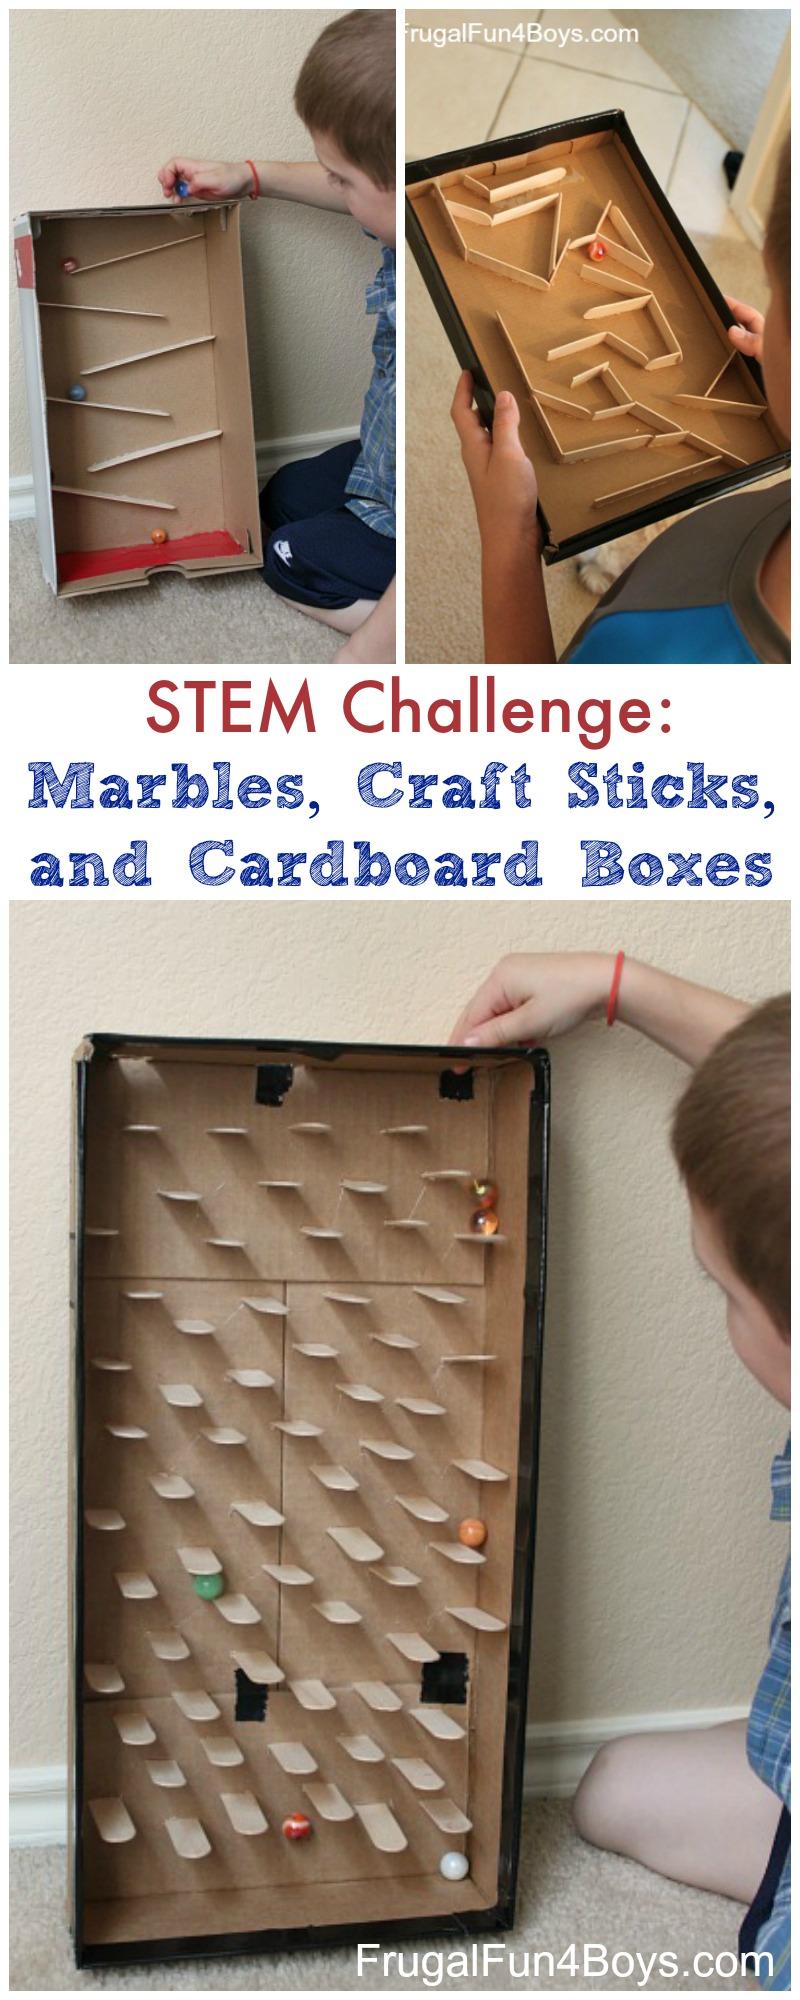 STEM Challenge:  Marbles, Craft Sticks, and Cardboard Boxes